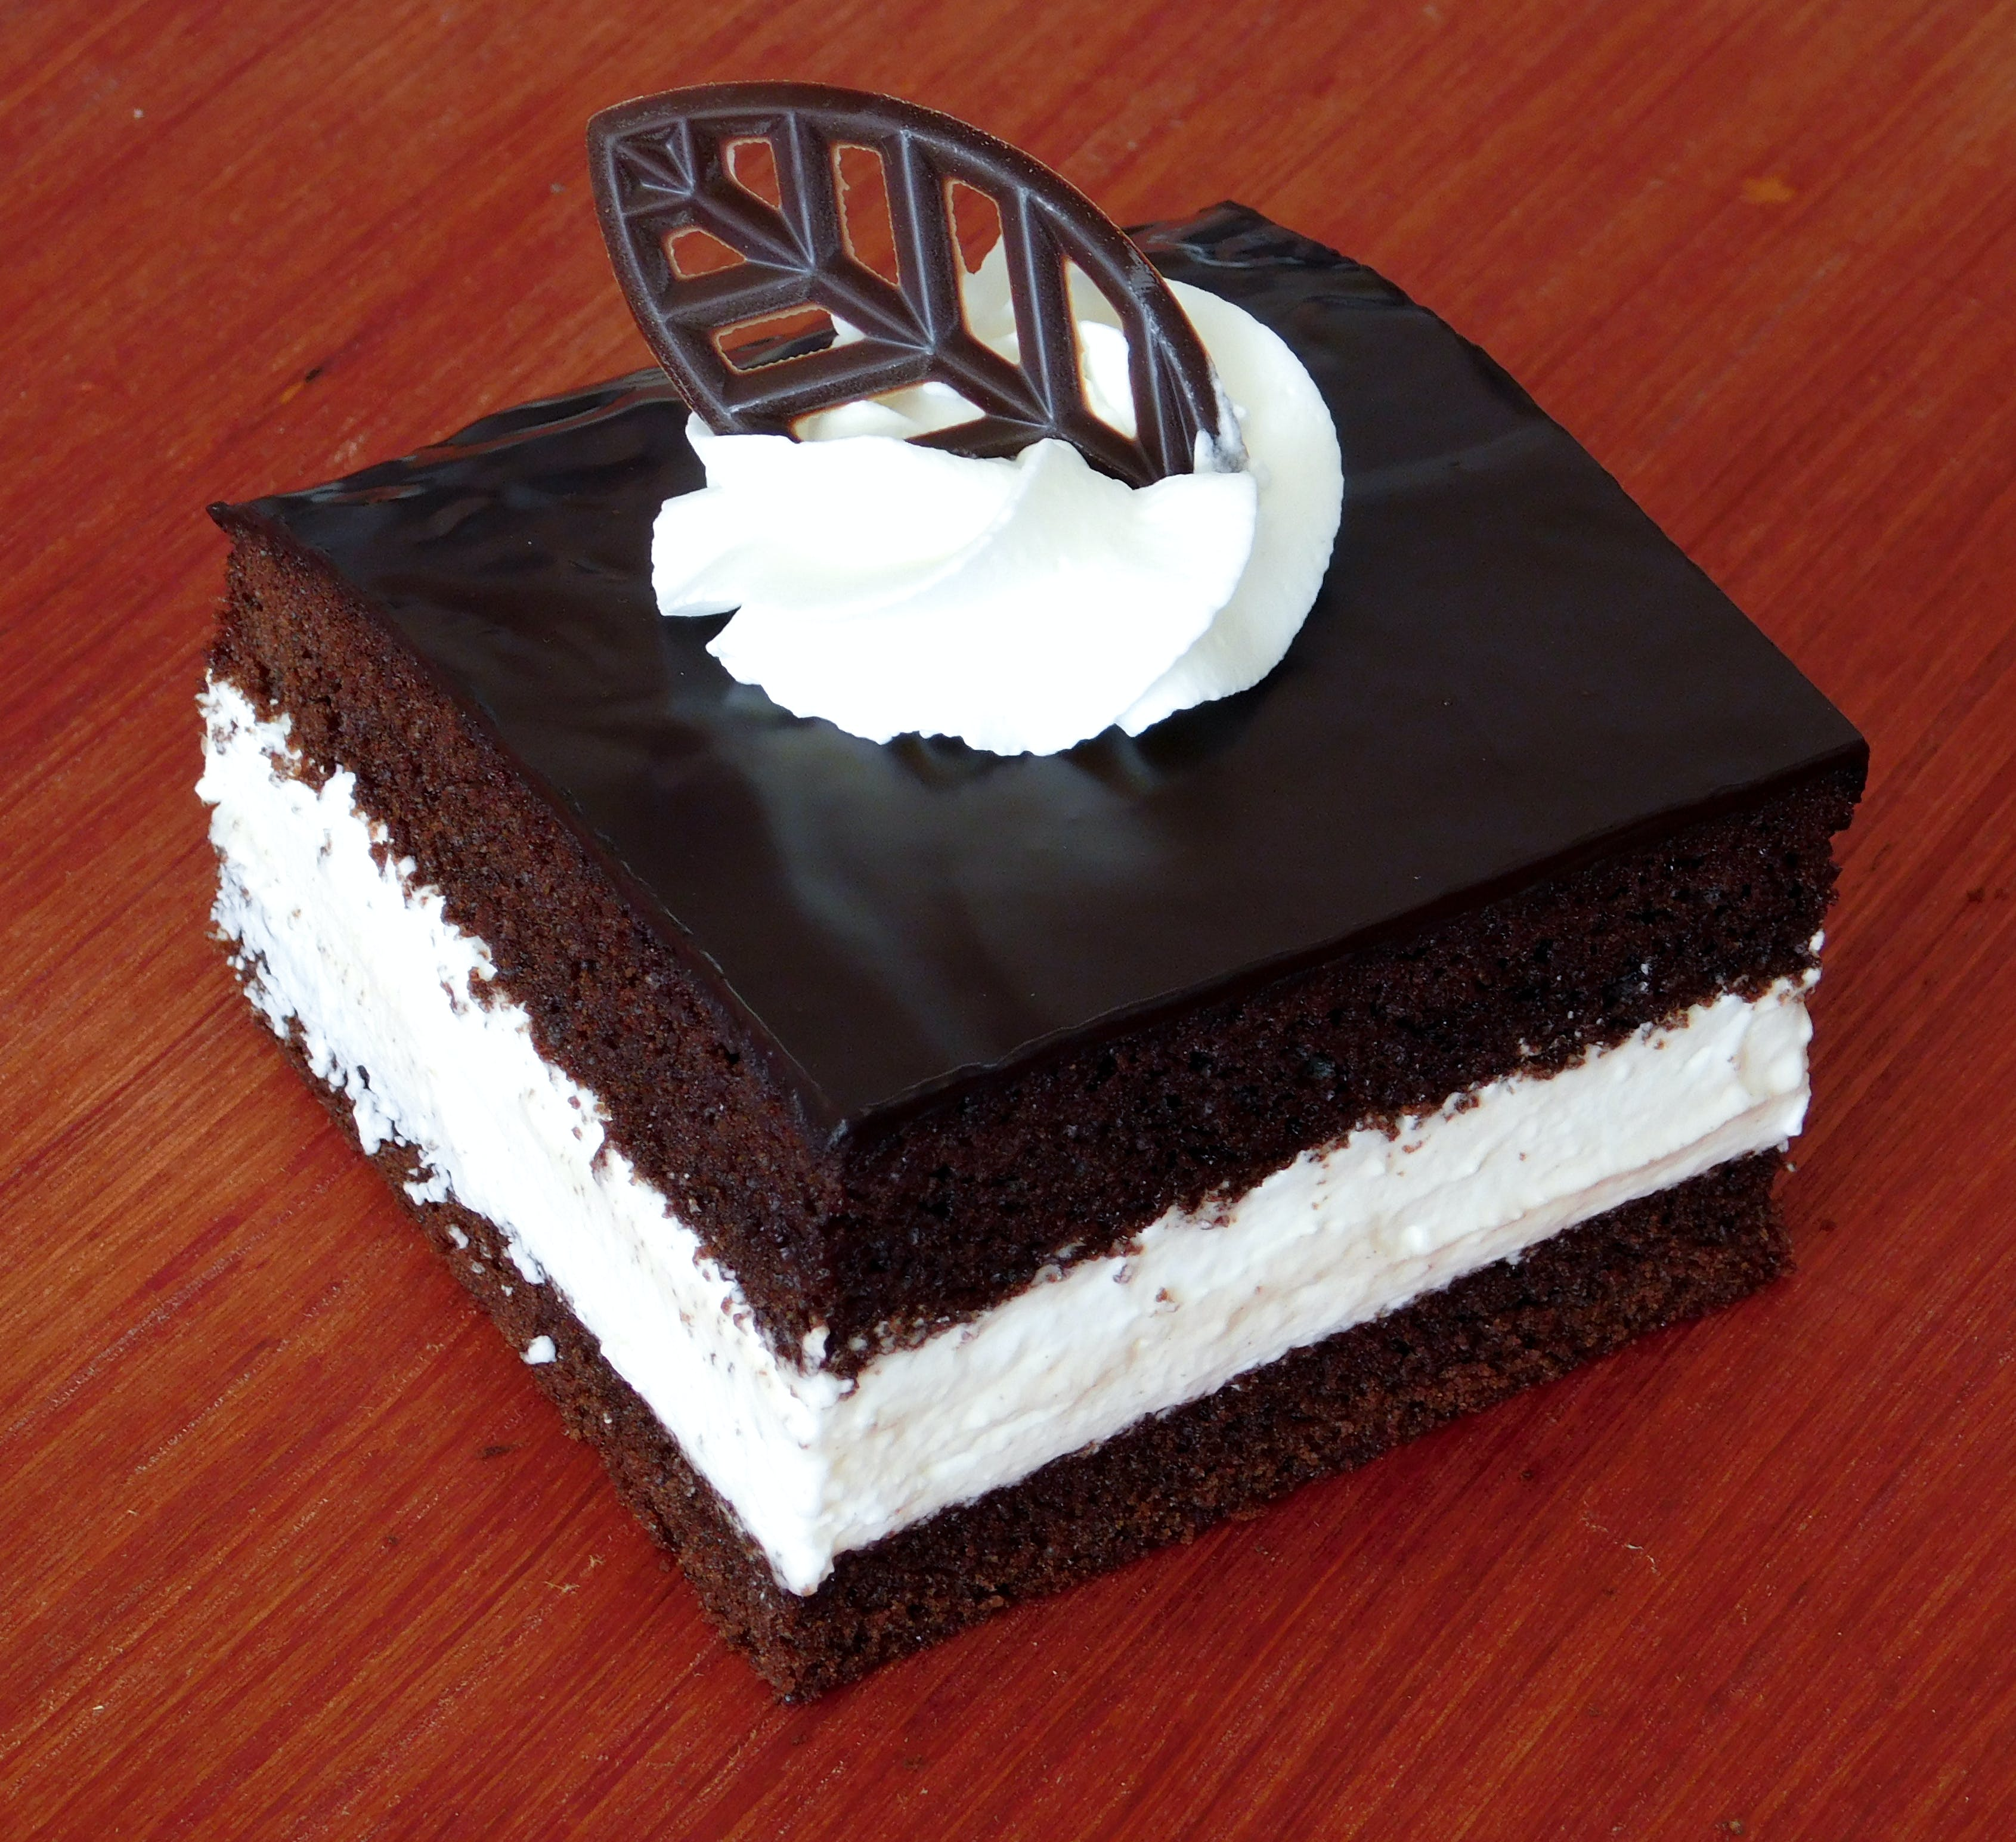 cake, chocolate cake, cream